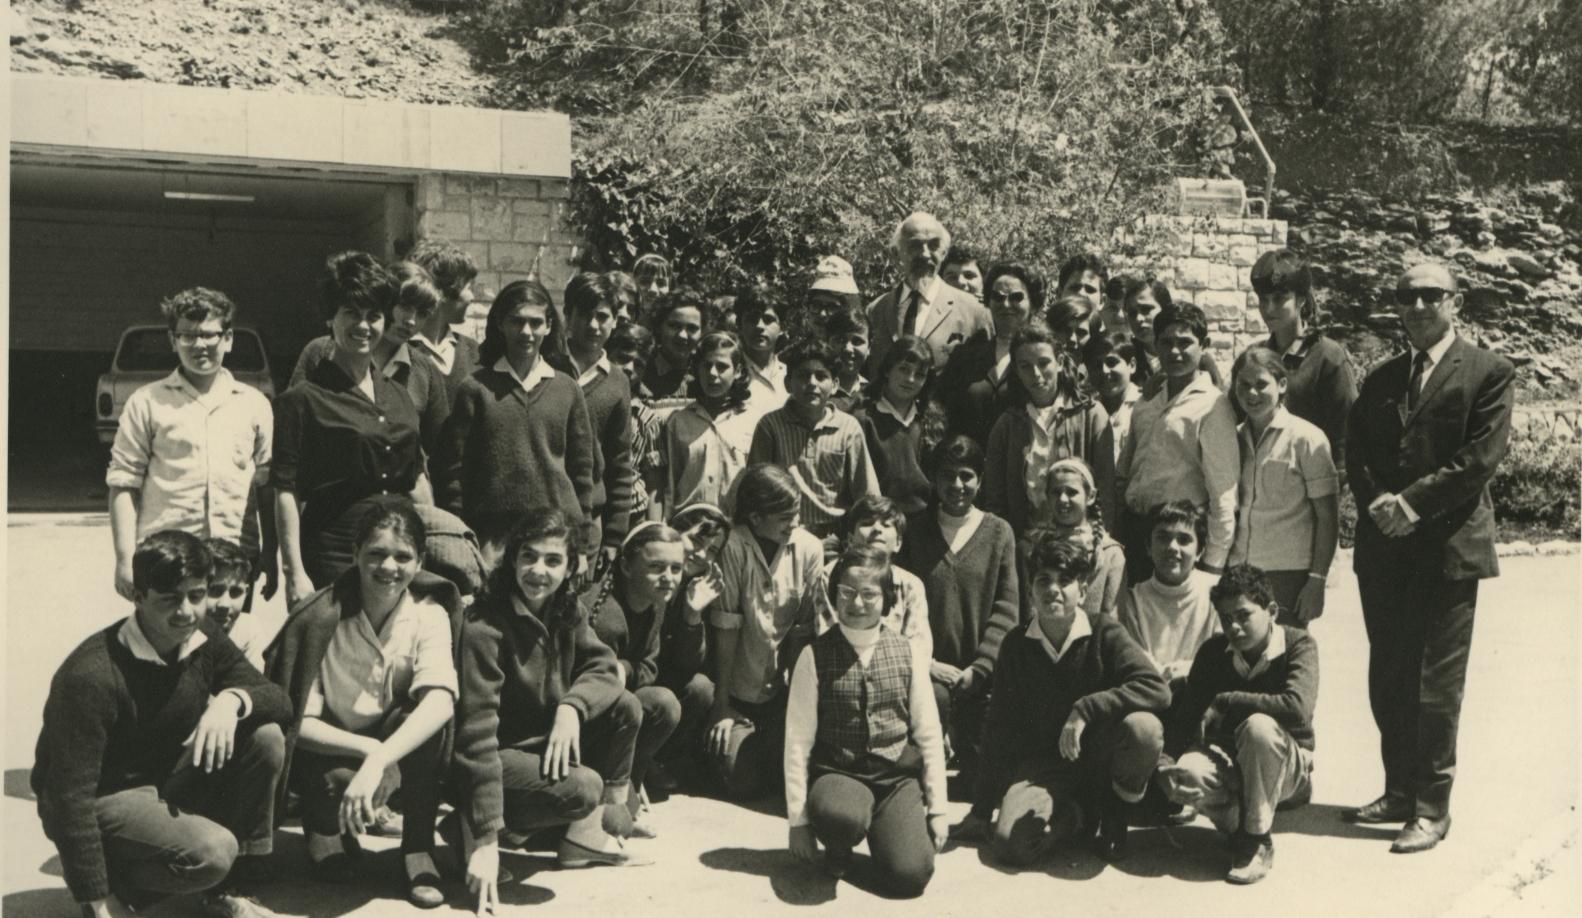 Tree Planting Ceremony in Honor of Eppo and Janke Kooy. Yad Vashem. 18.04.1969